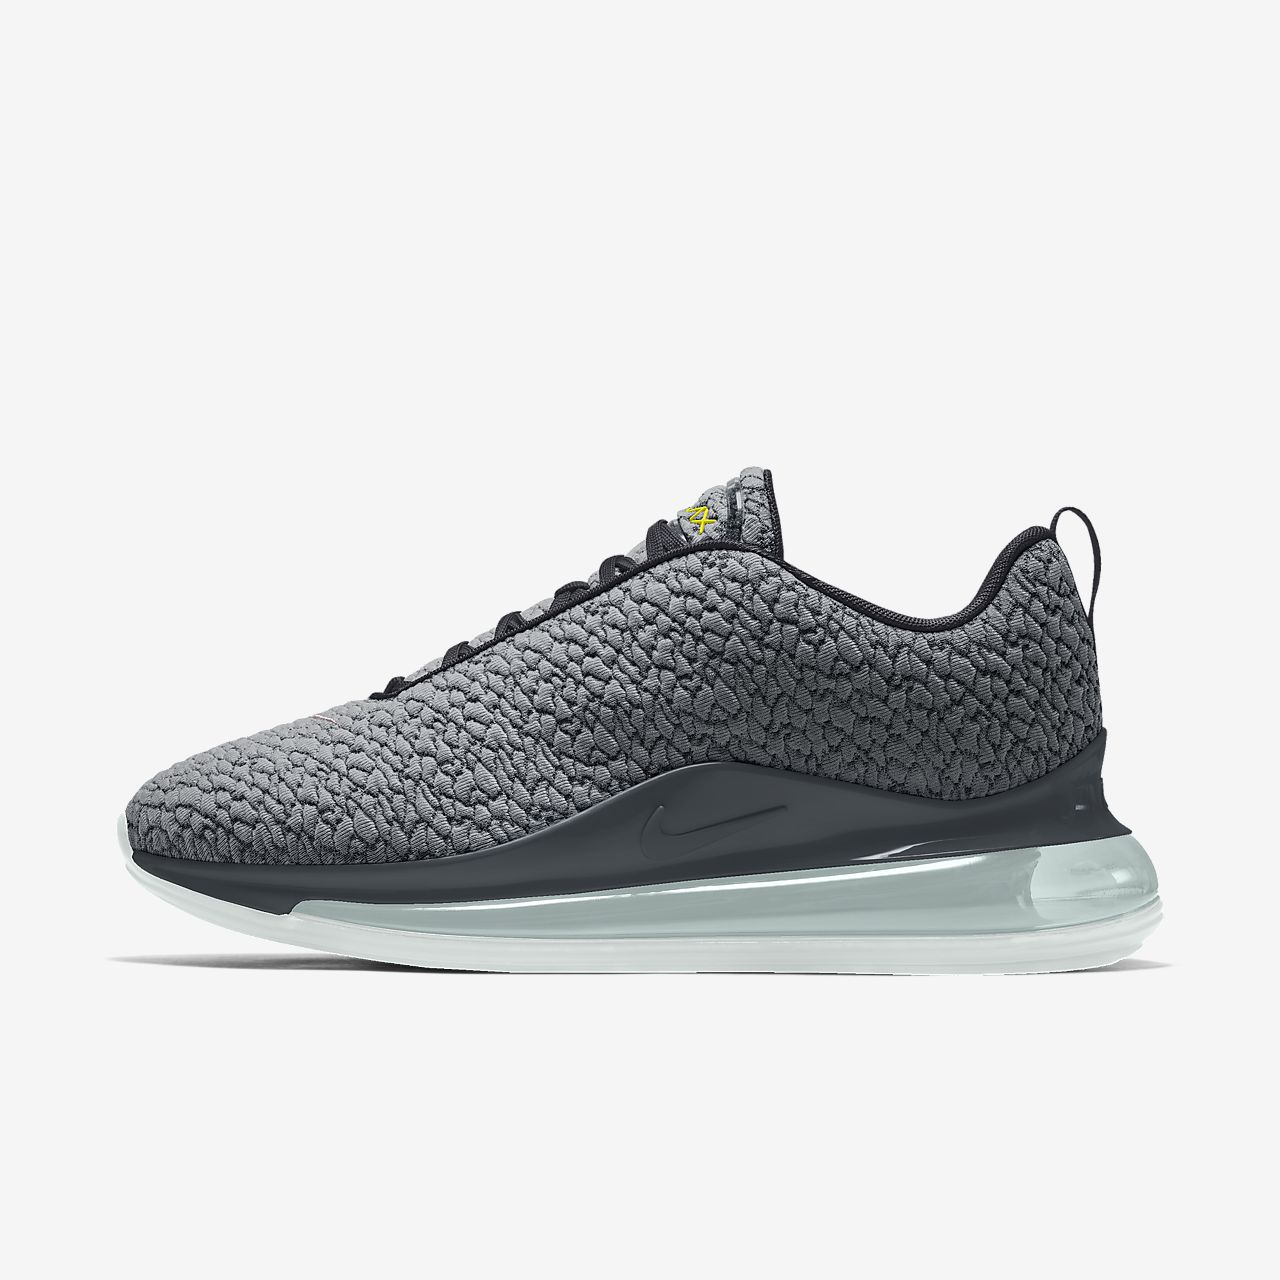 Nike Air Max 720 Premium By You Custom